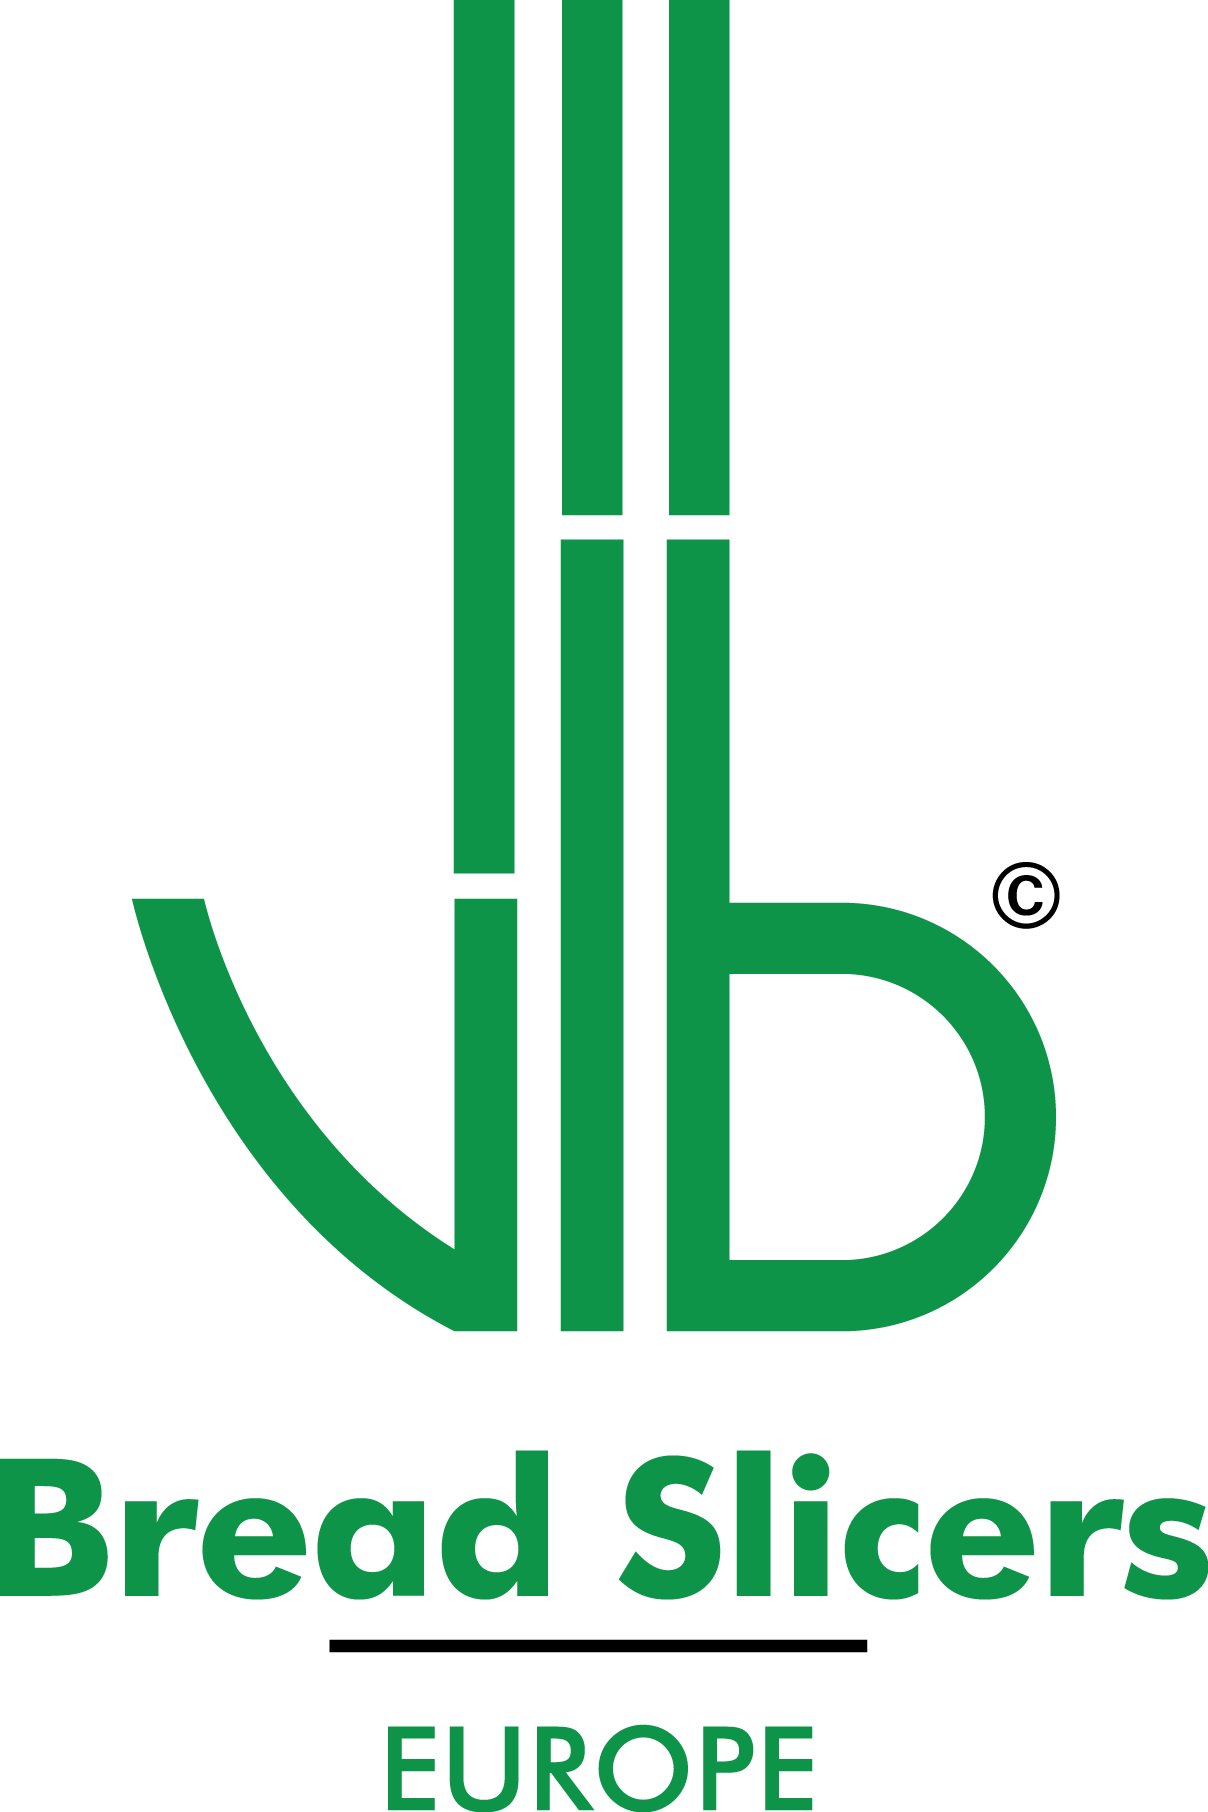 VLB Bread Slicers